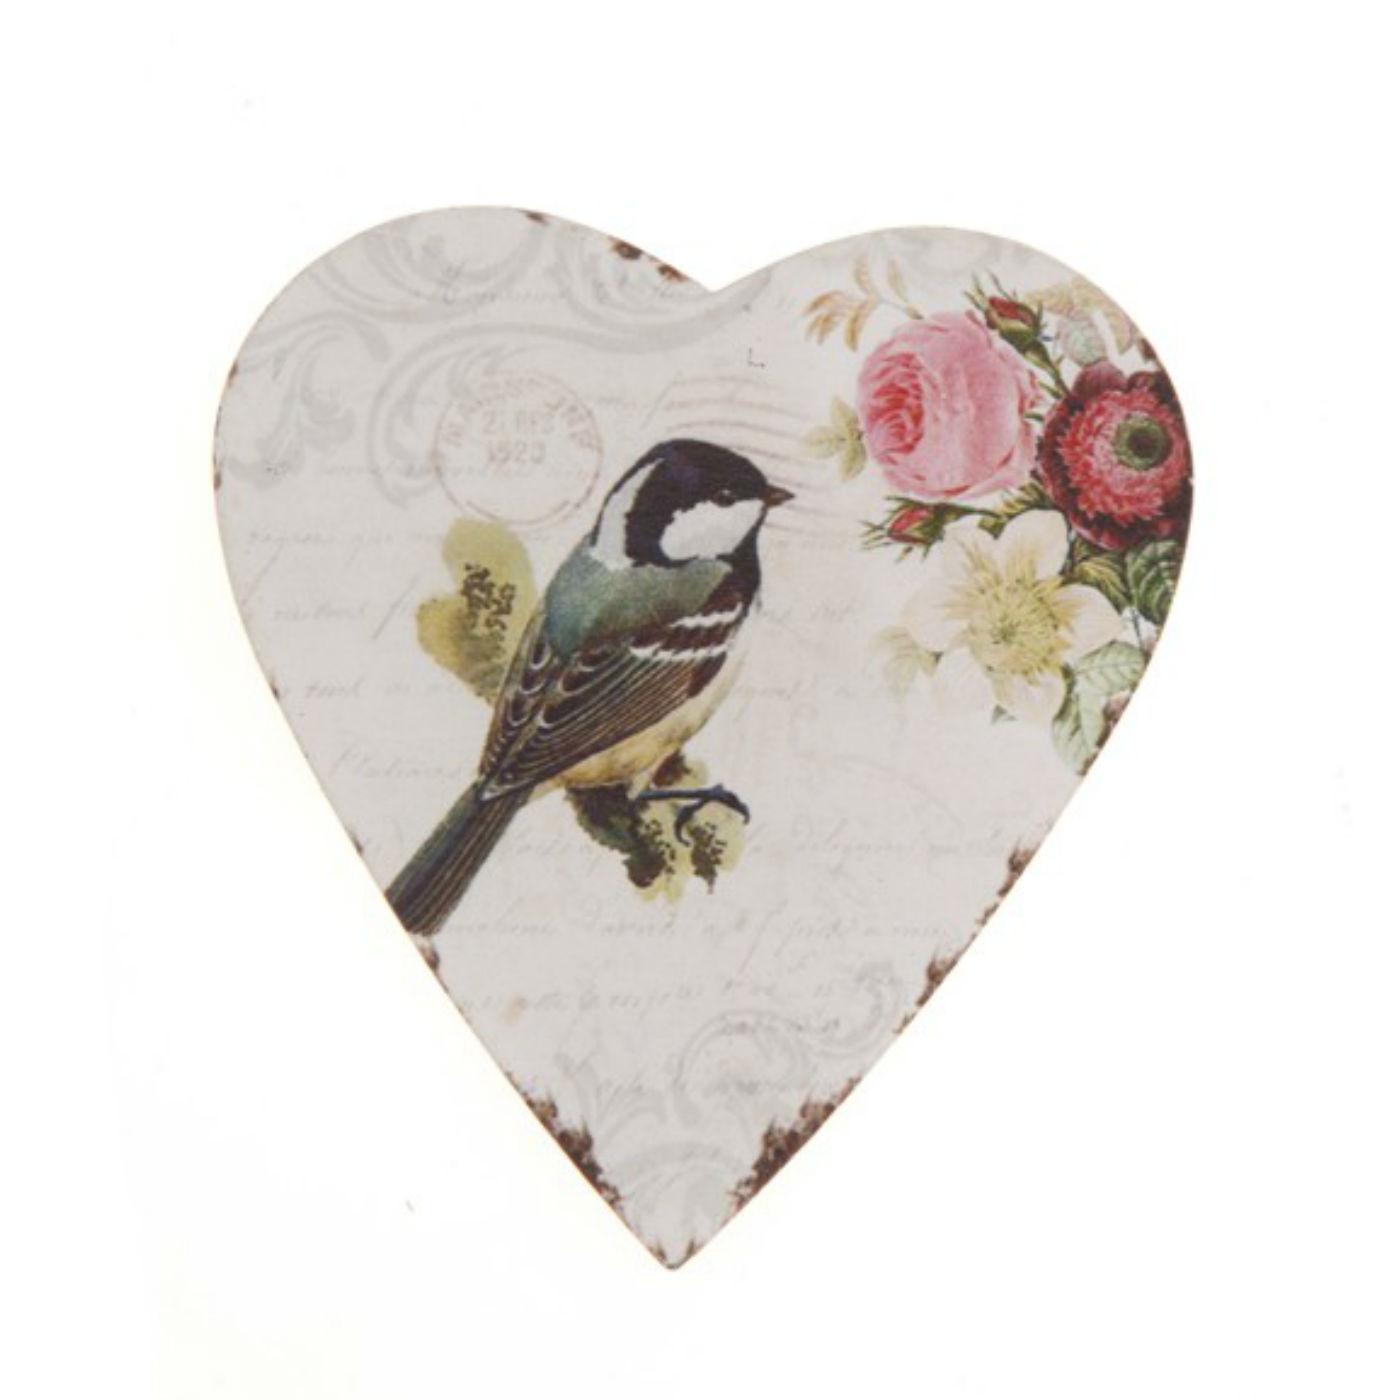 sass-and-belle-bird-with-flowers-fridge-magnet.jpg